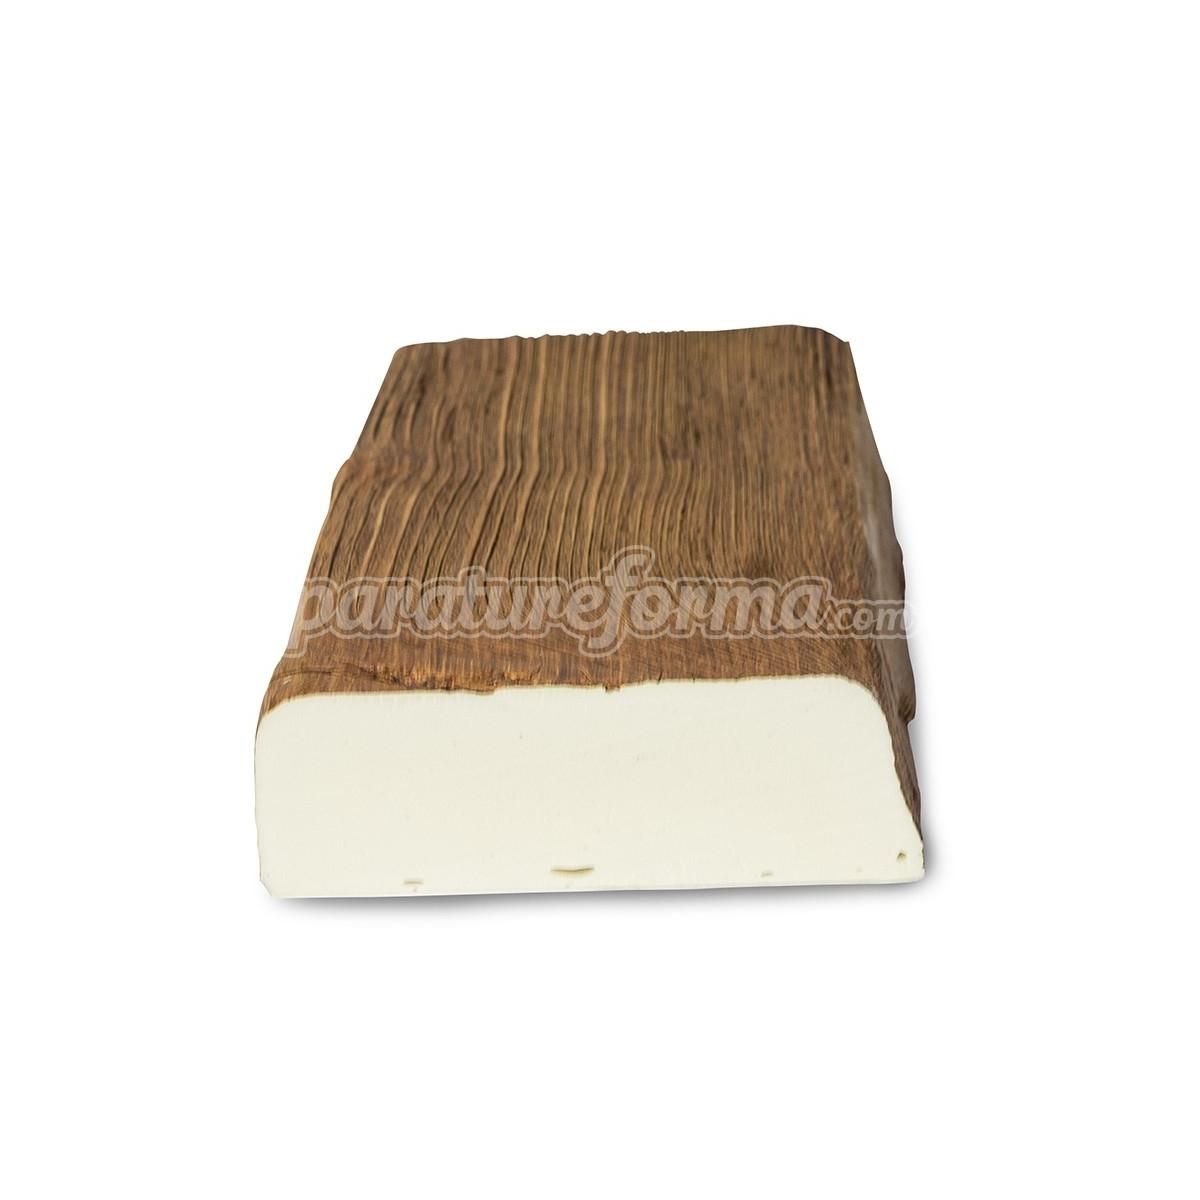 Viga maciza 300x12,5x4 imitación madera Vigas imitación madera cuadradas